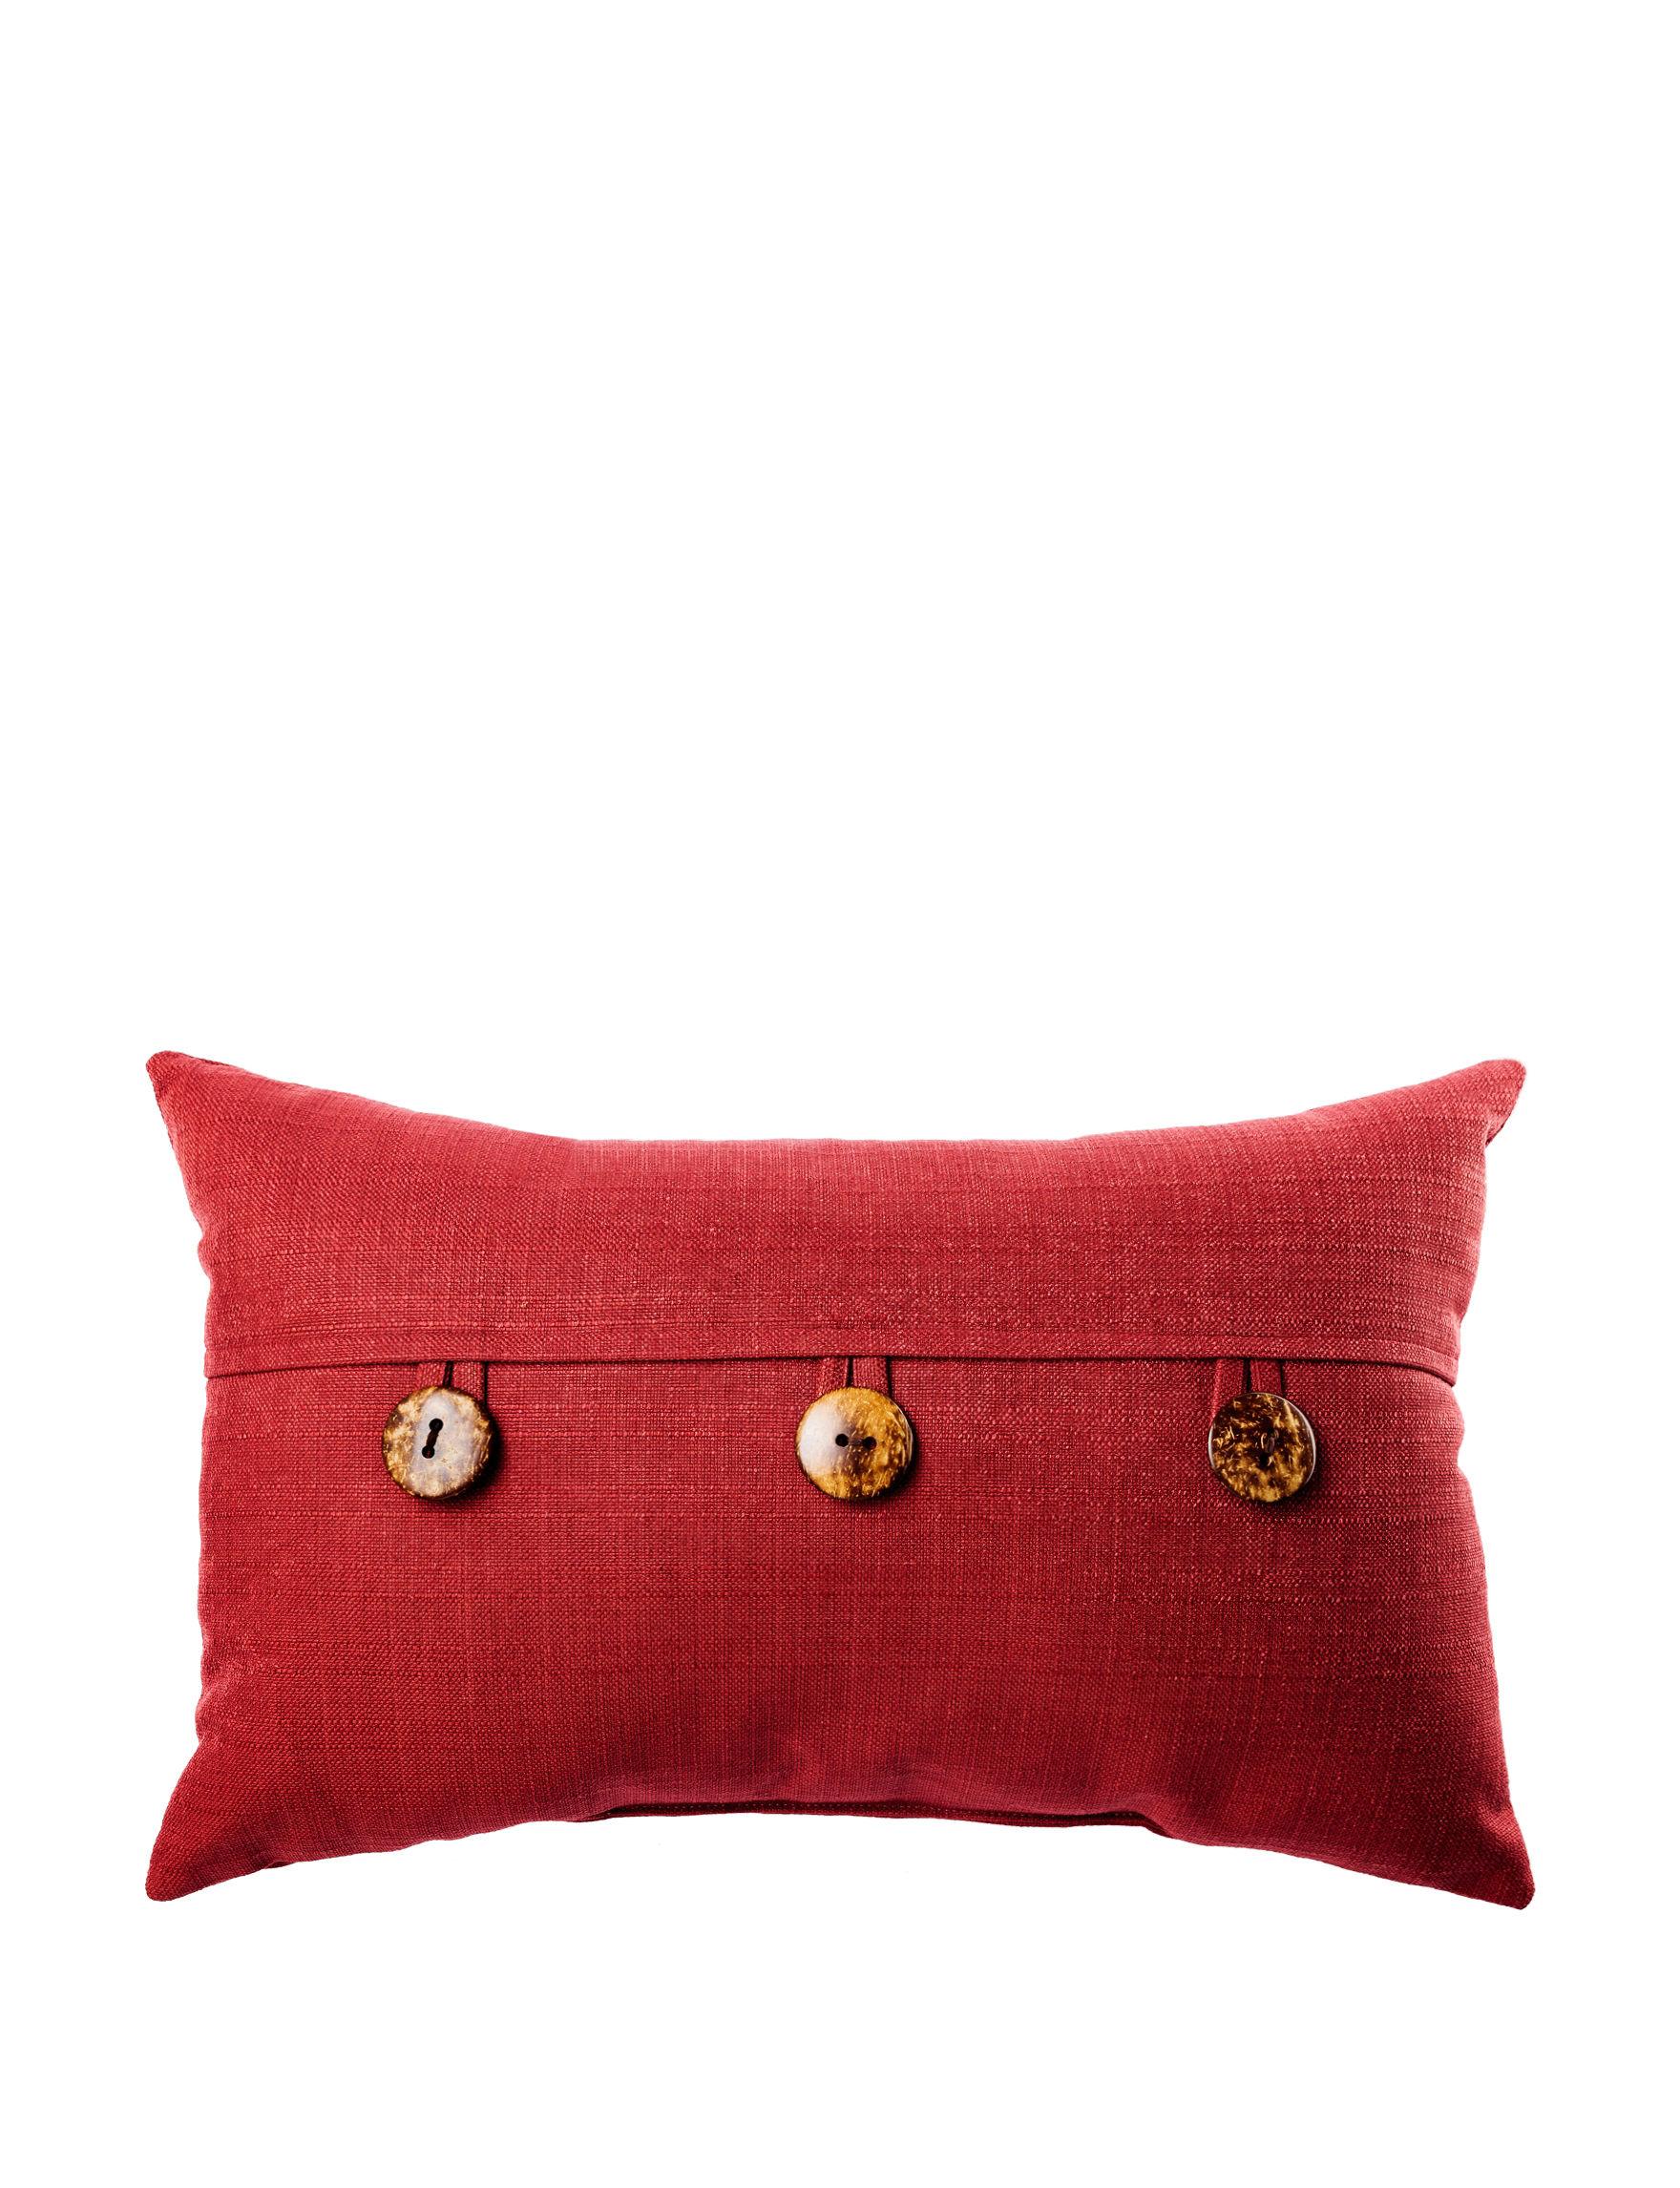 Home Fashions International Ruby Decorative Pillows